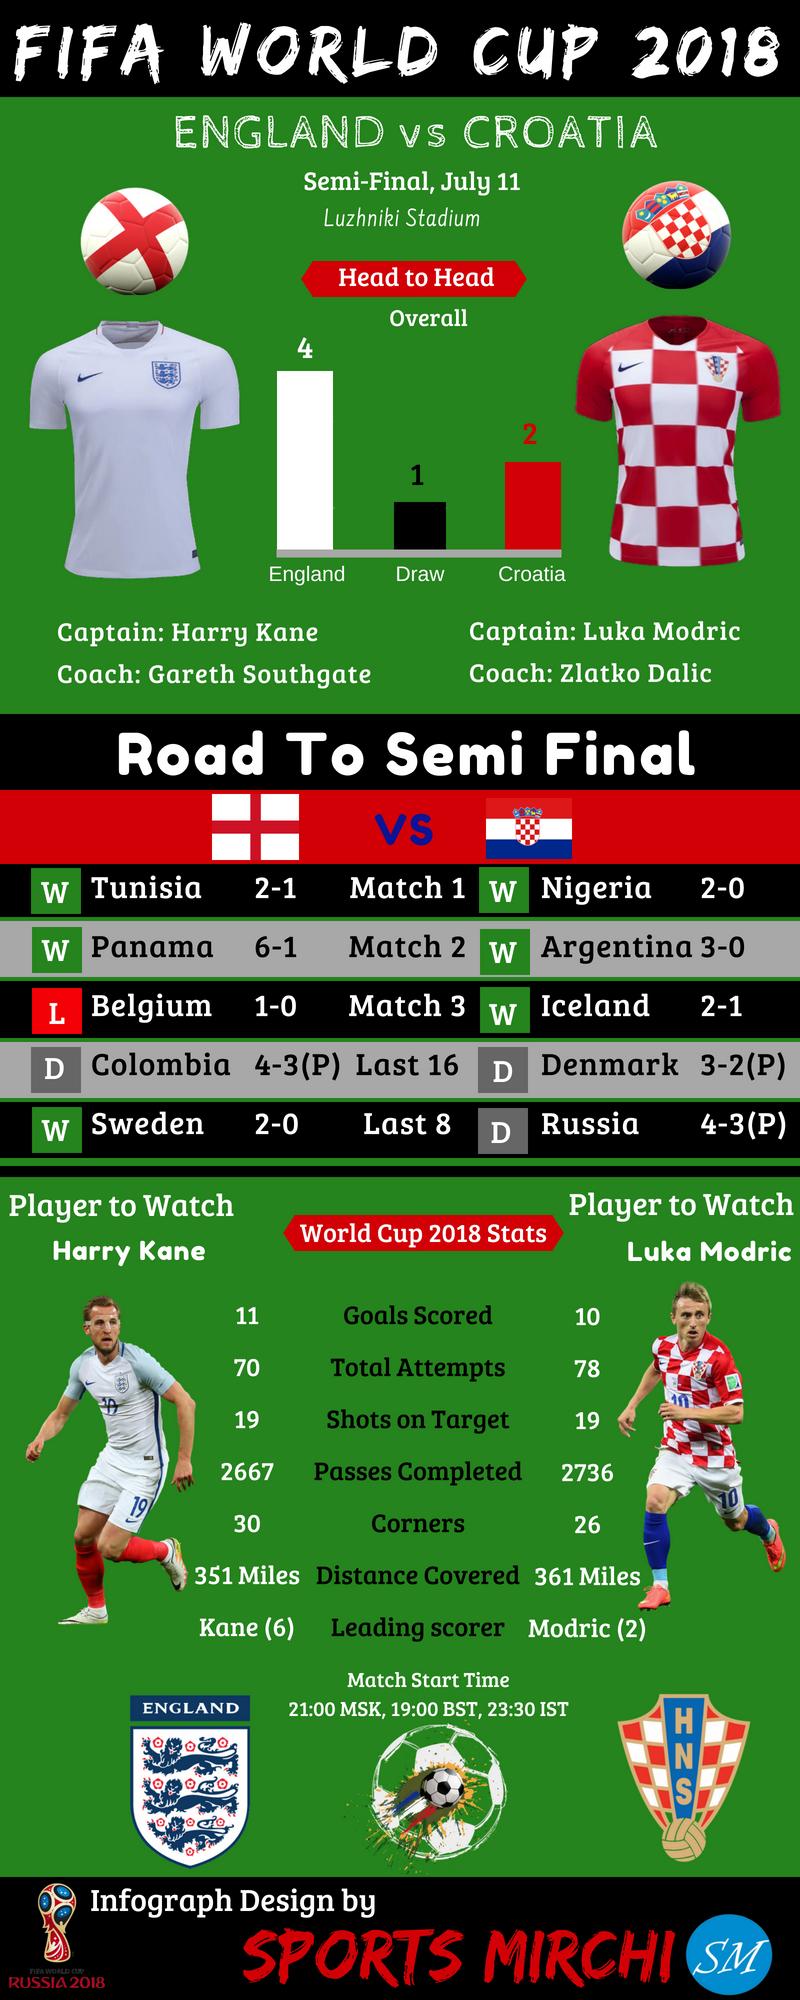 croatia vs england - photo #11